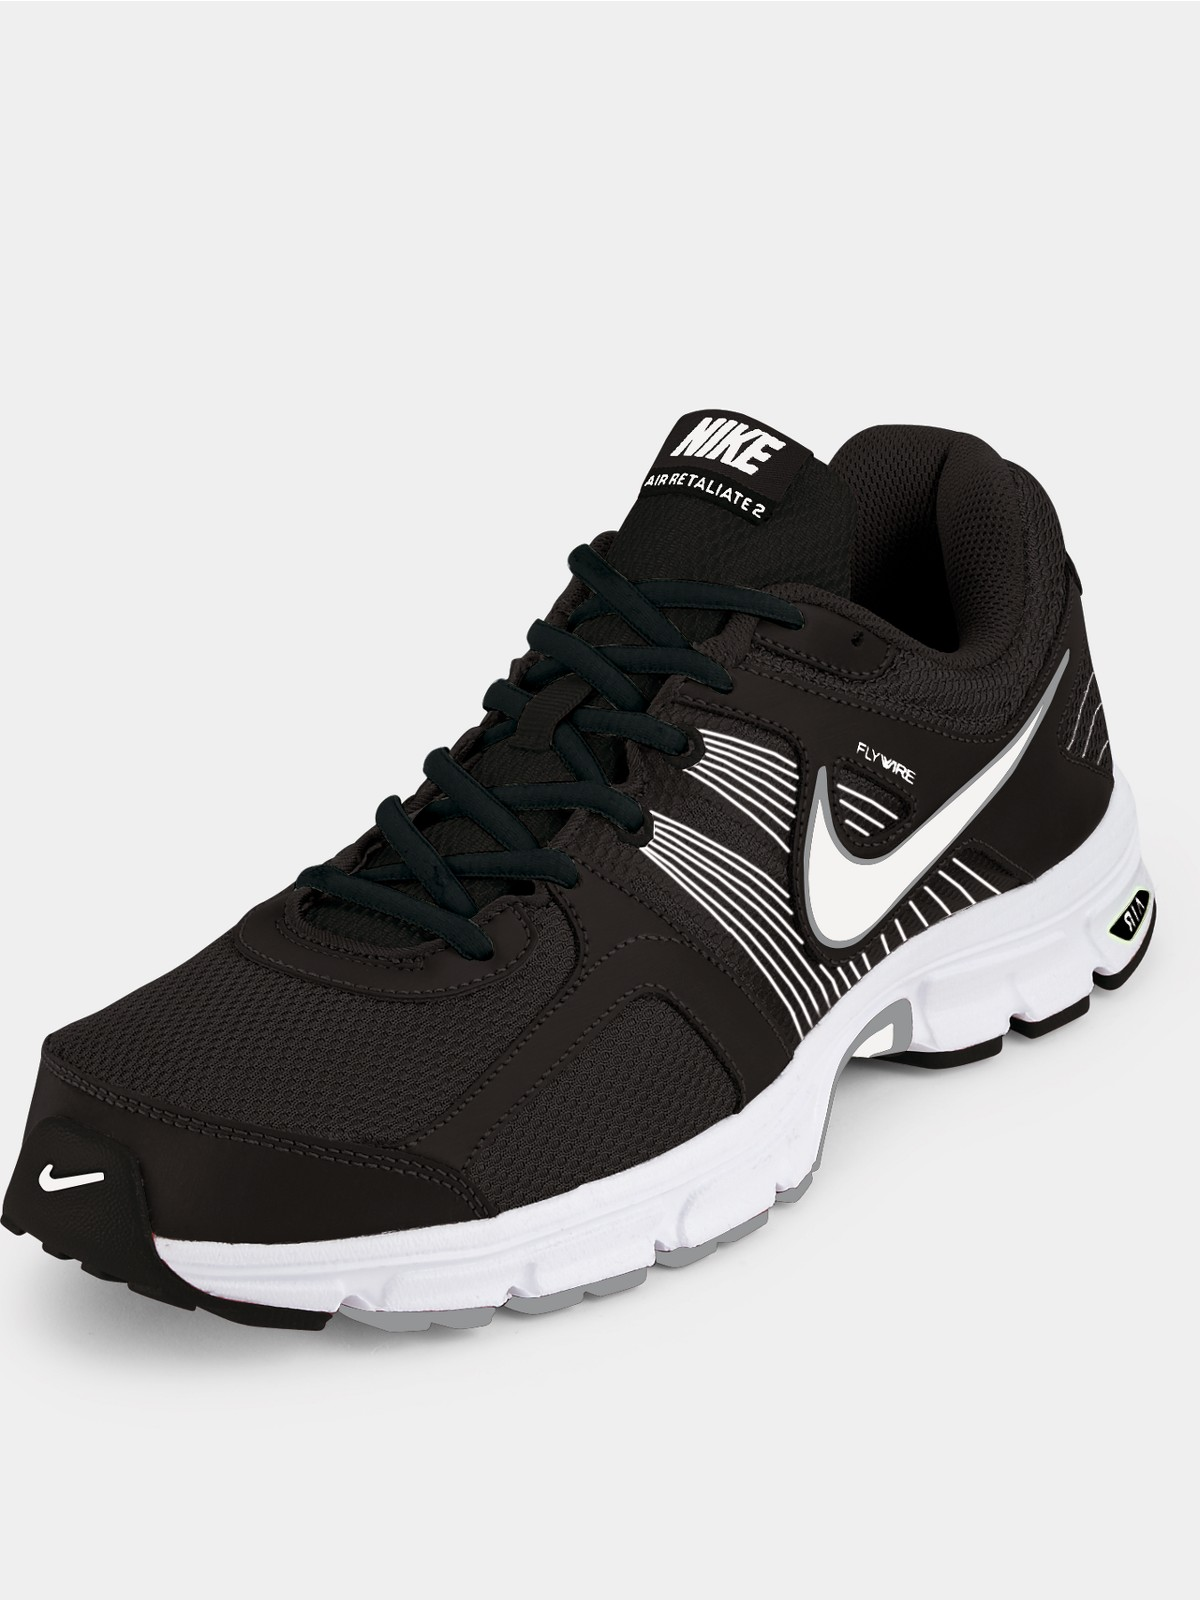 Nike Free Run 2 Black And White Men